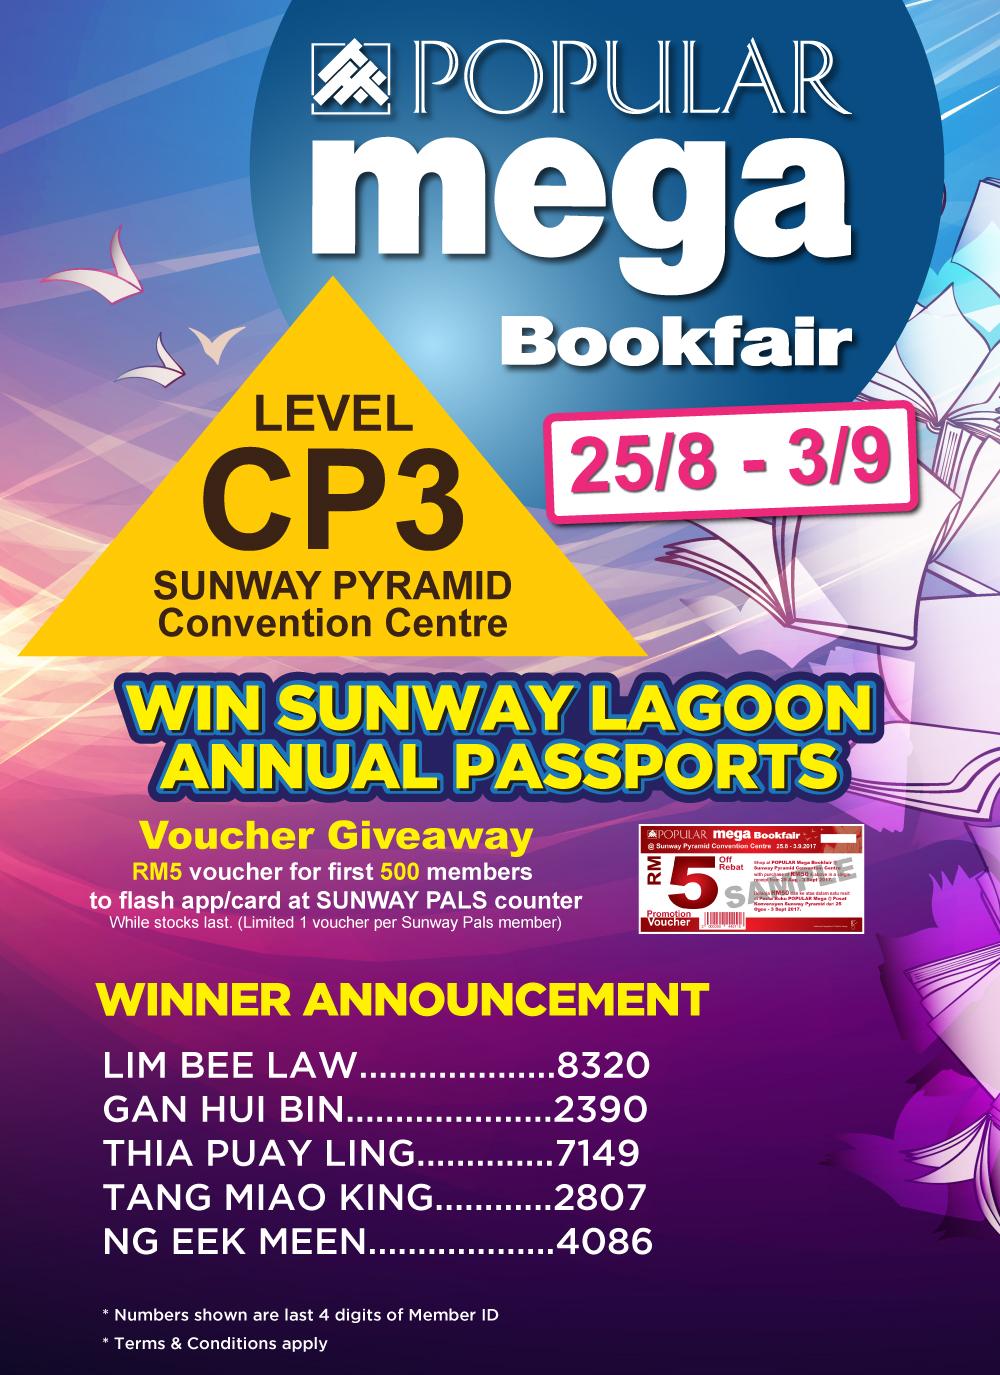 Popular Mega Bookfair 2017